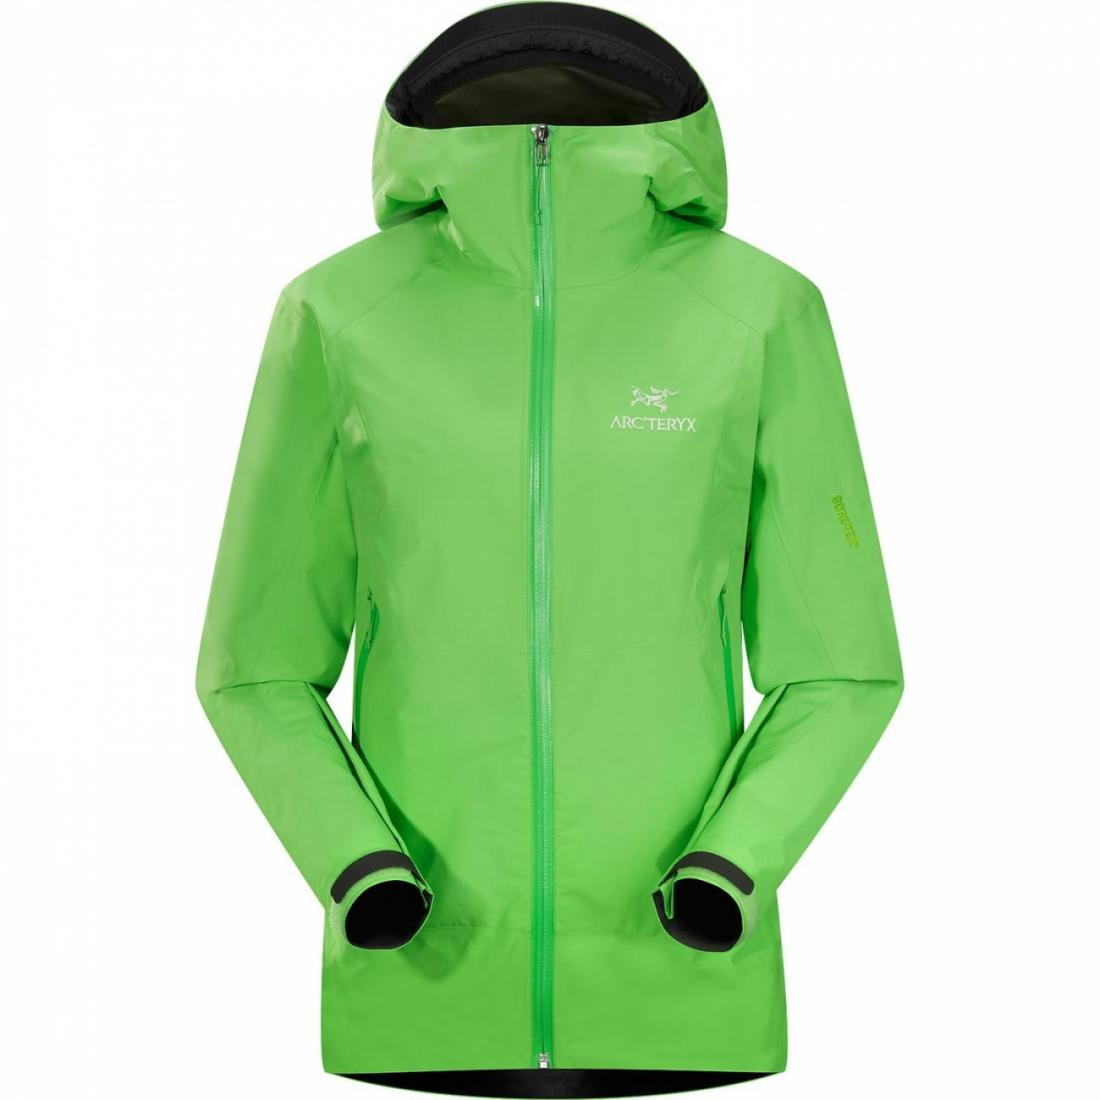 Куртка Beta SL жен.Куртки<br><br><br>Цвет: Светло-зеленый<br>Размер: M